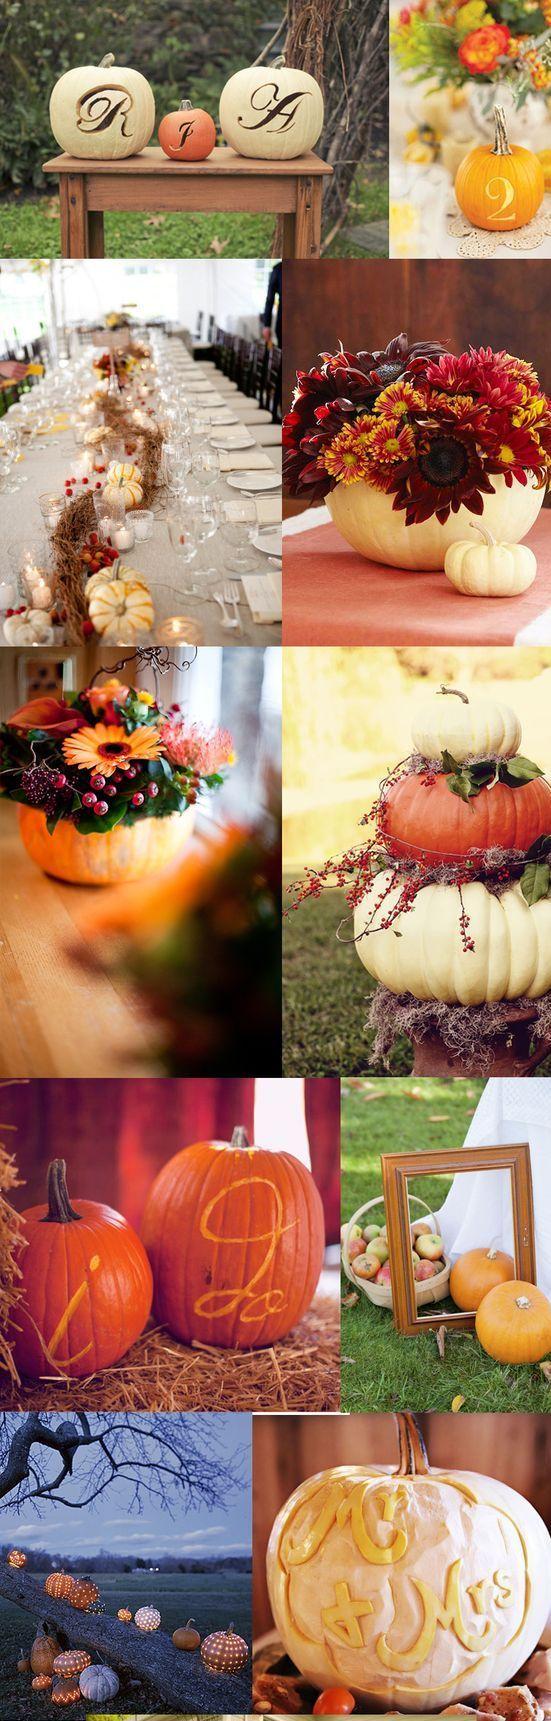 65 amazing fall pumpkins wedding decor ideas - Fall Pumpkin Decorations